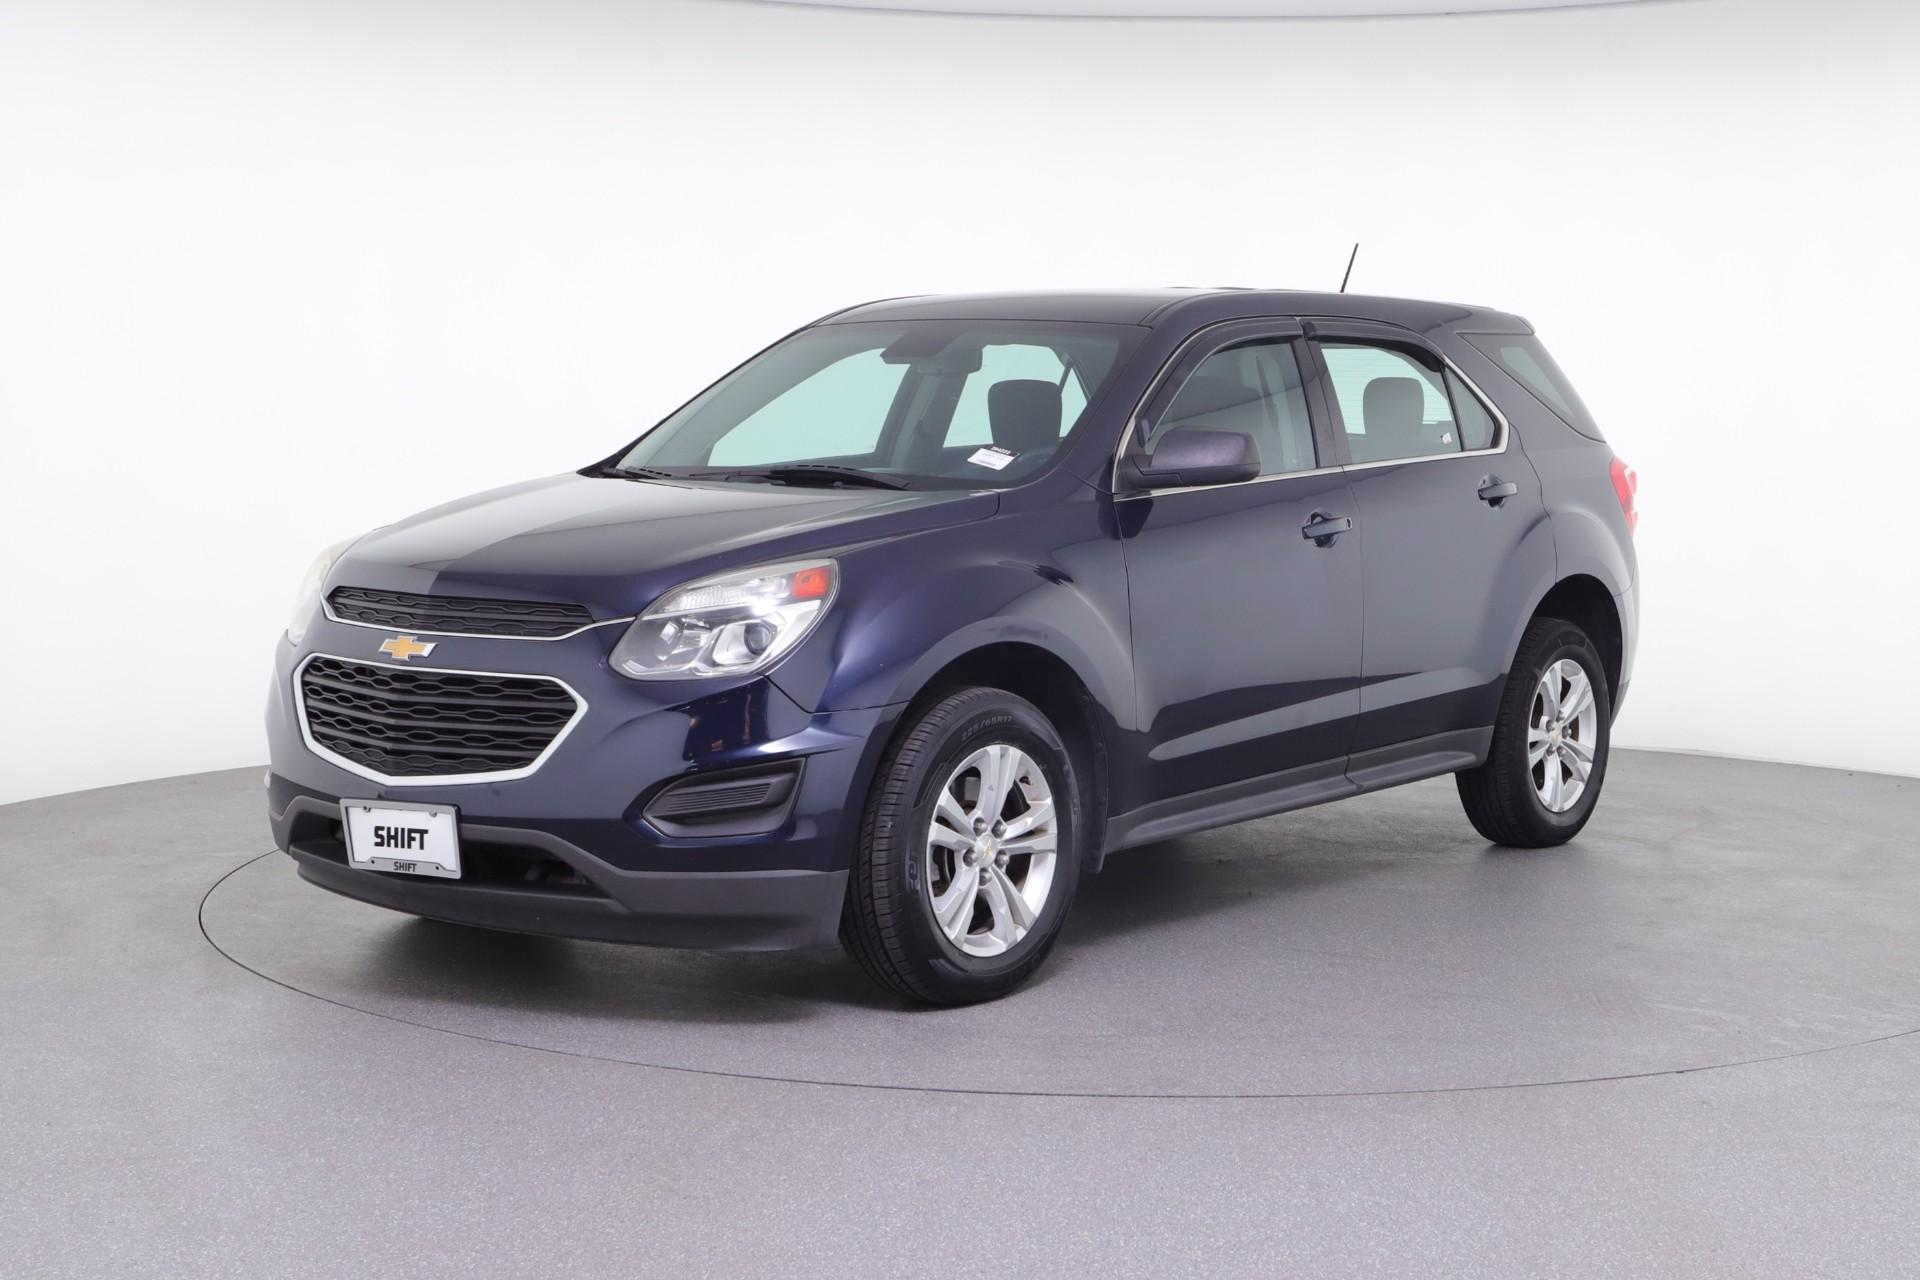 Chevrolet Equinox LS (from $15,850)